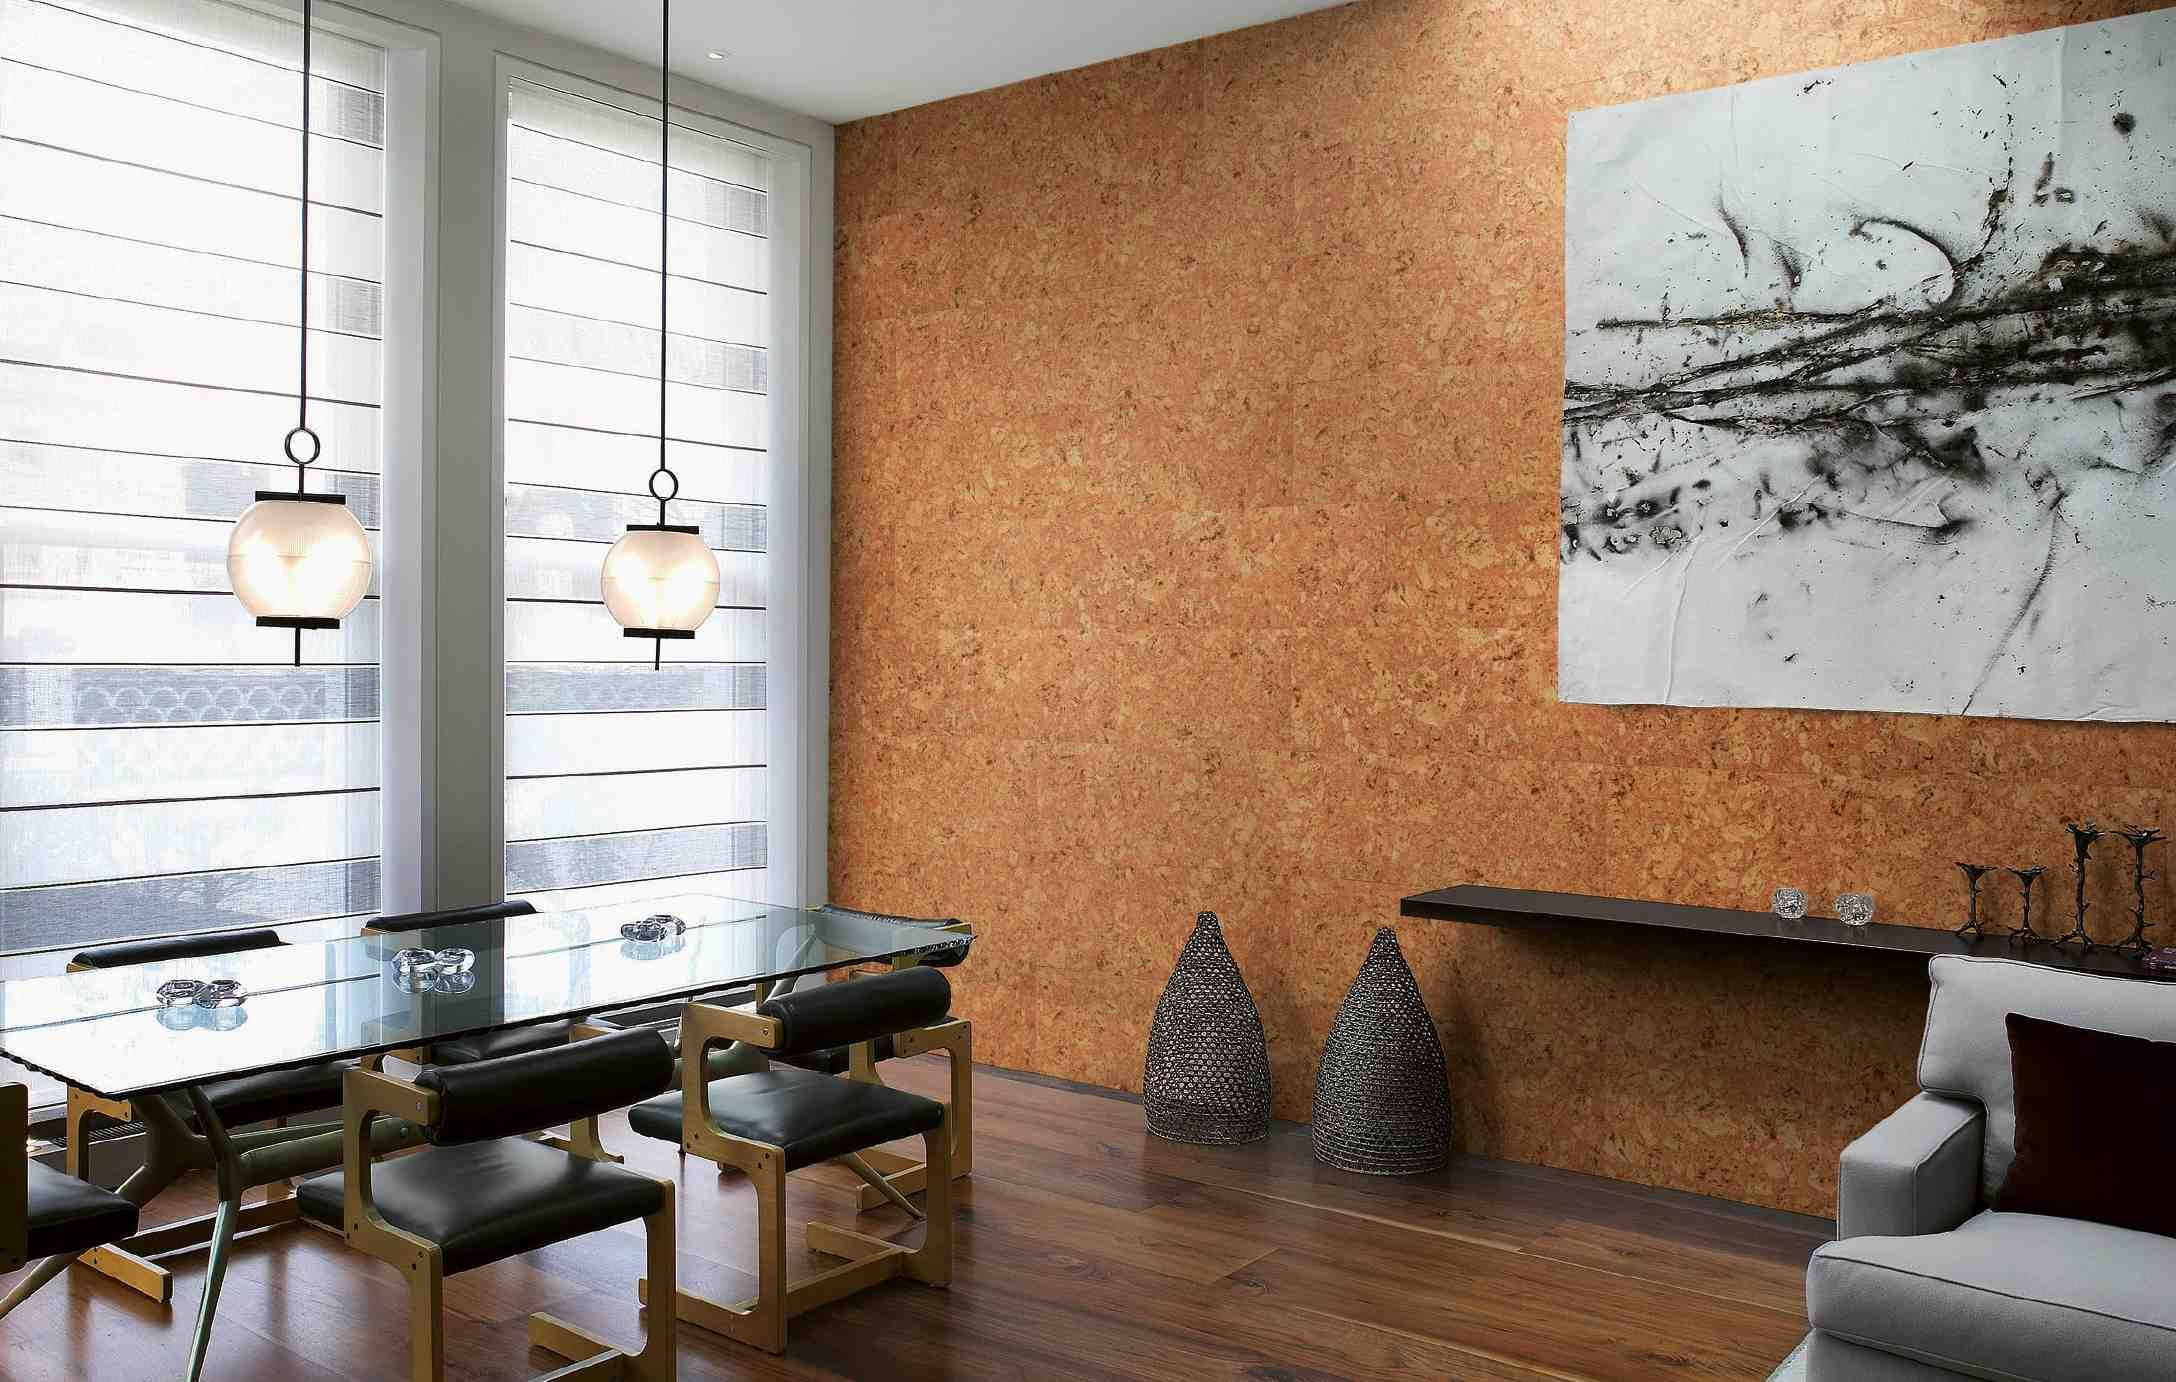 Korek Na Sciane Inspiracje Korkowe Dekoracje Scian Opinie I Zdjecia Home Decor Cork Wallpaper Furniture